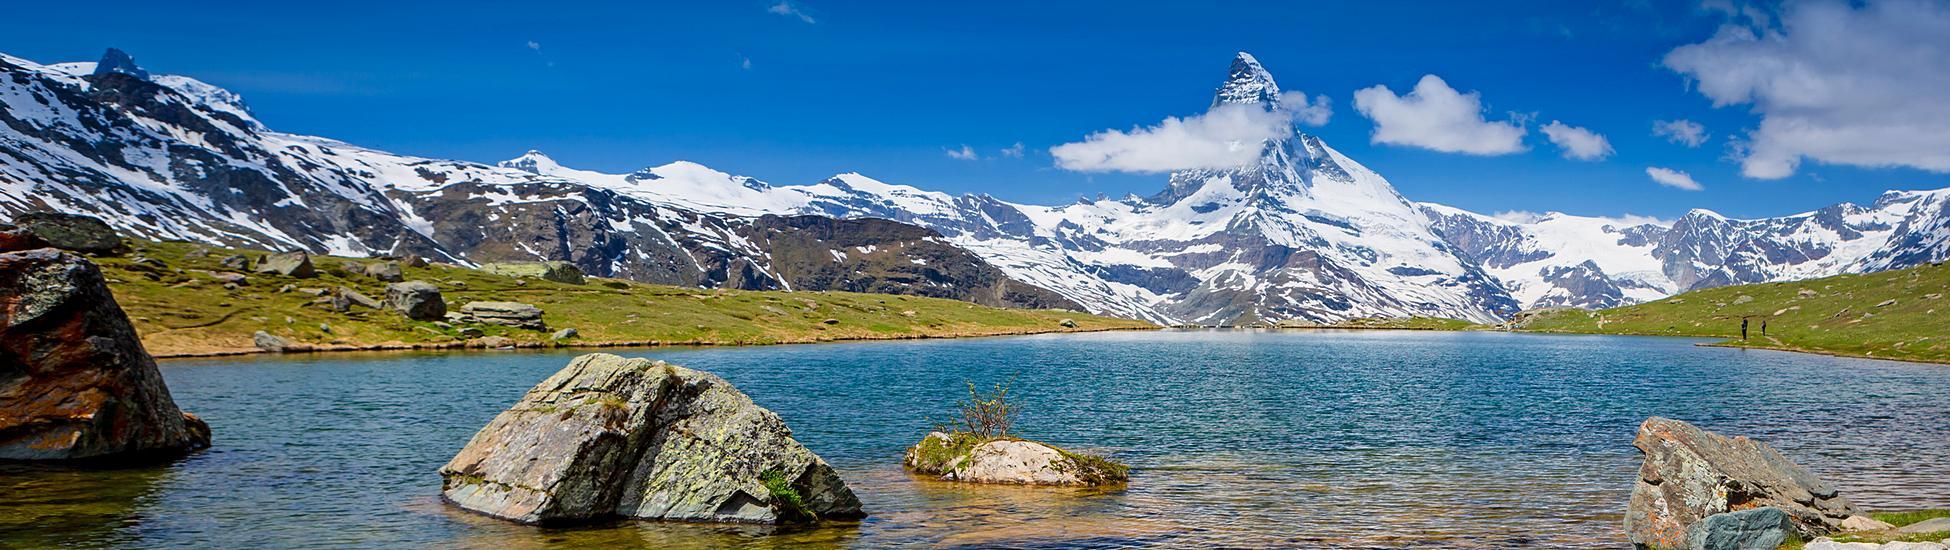 Szwajcaria - u stóp Matterhornu